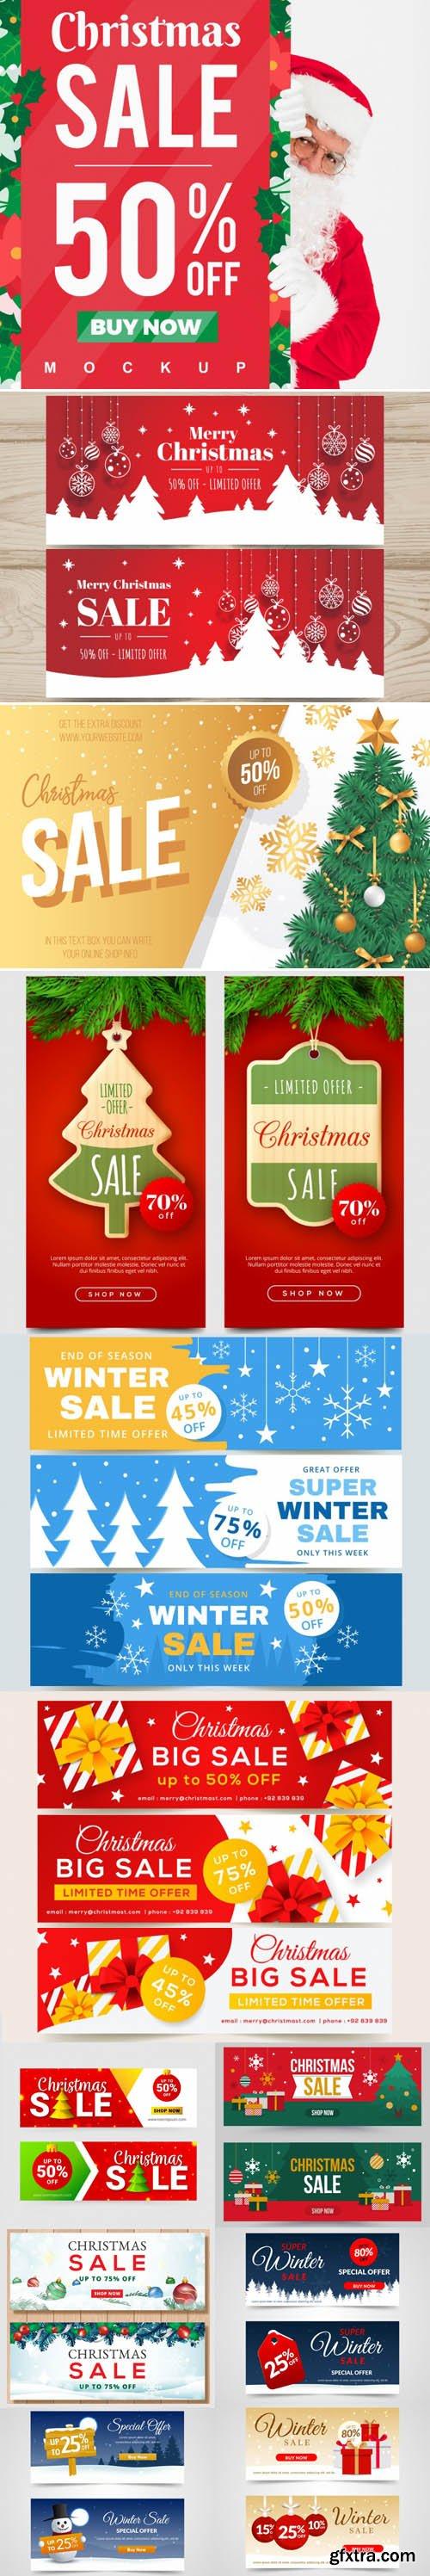 Holiday & Christmas Sales Vector Bundle 7